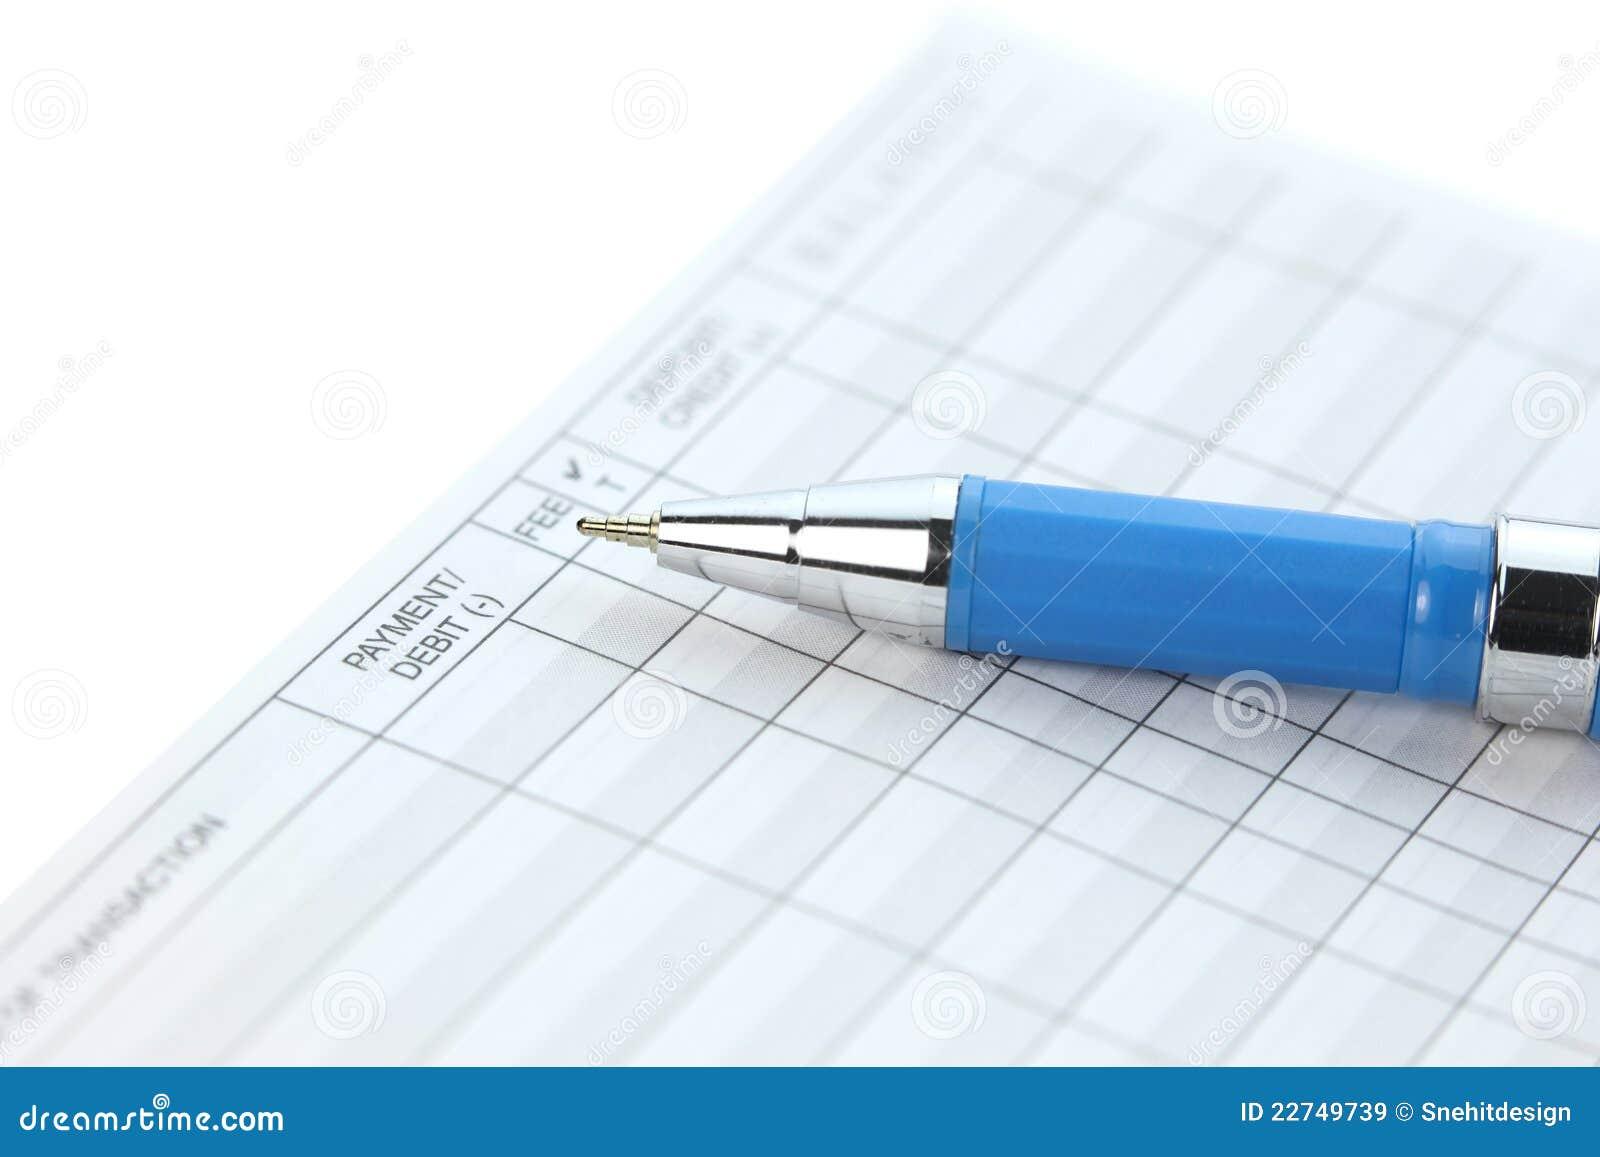 check balance sheet stock image image of blue maths 22749739